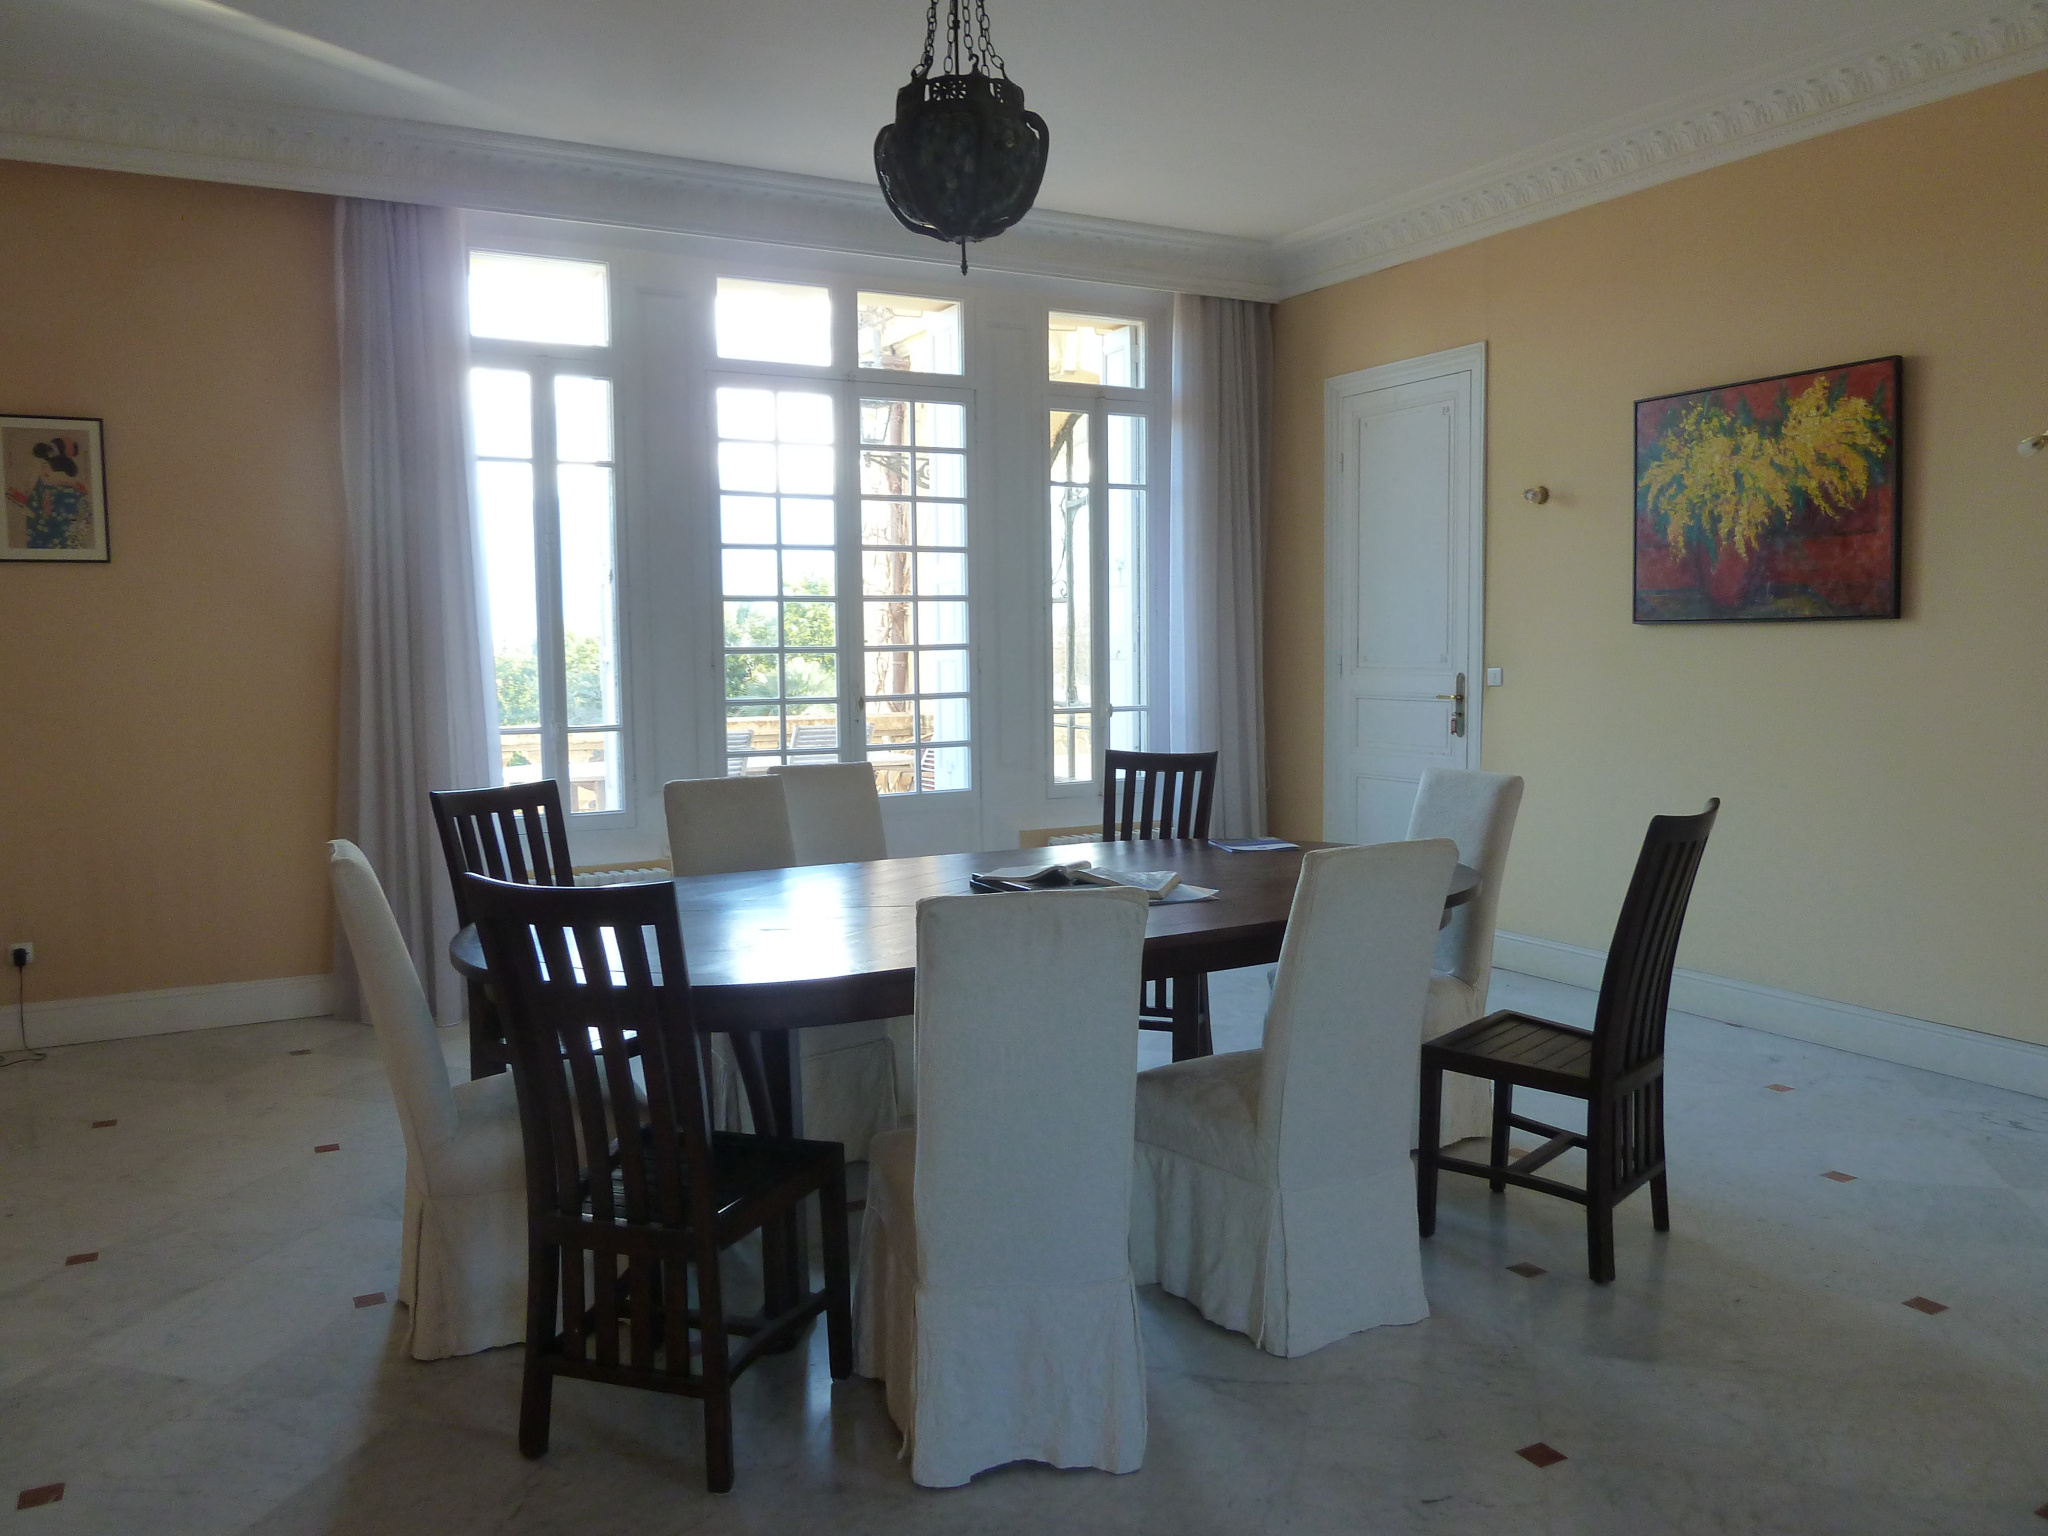 À vendre chateau de 760m2 à brouilla (66620) - Photo 21'